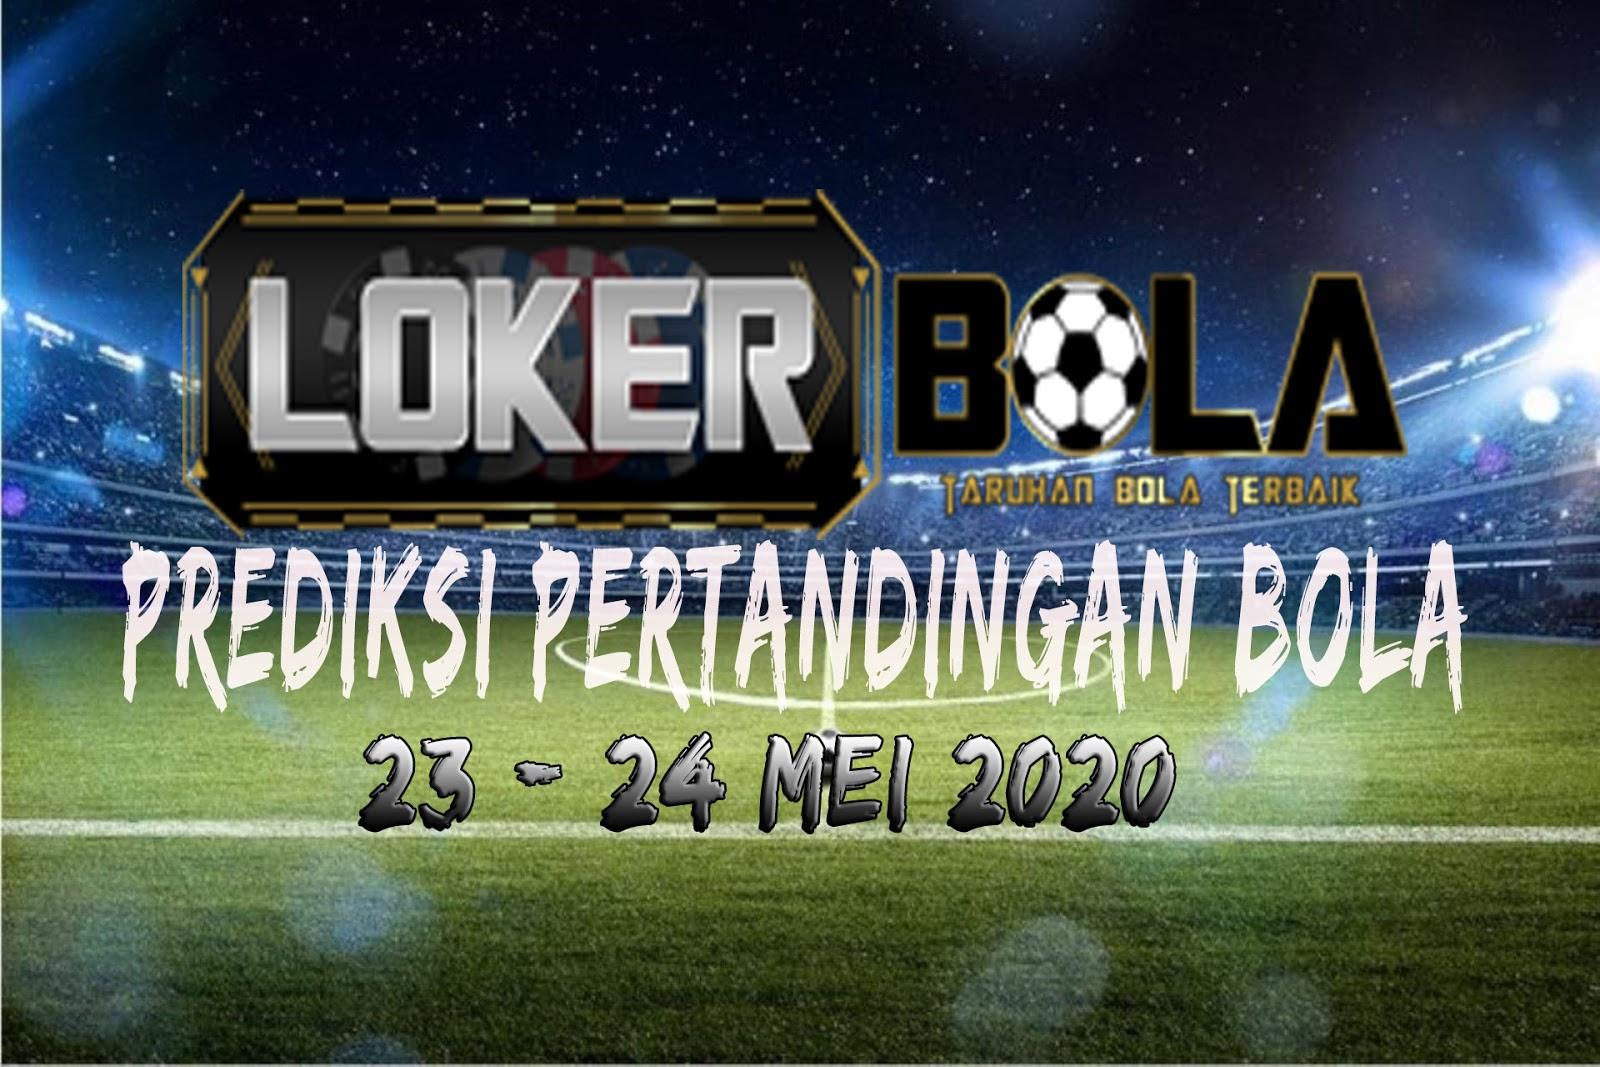 PREDIKSI PERTANDINGAN BOLA 23 – 24  May 2020